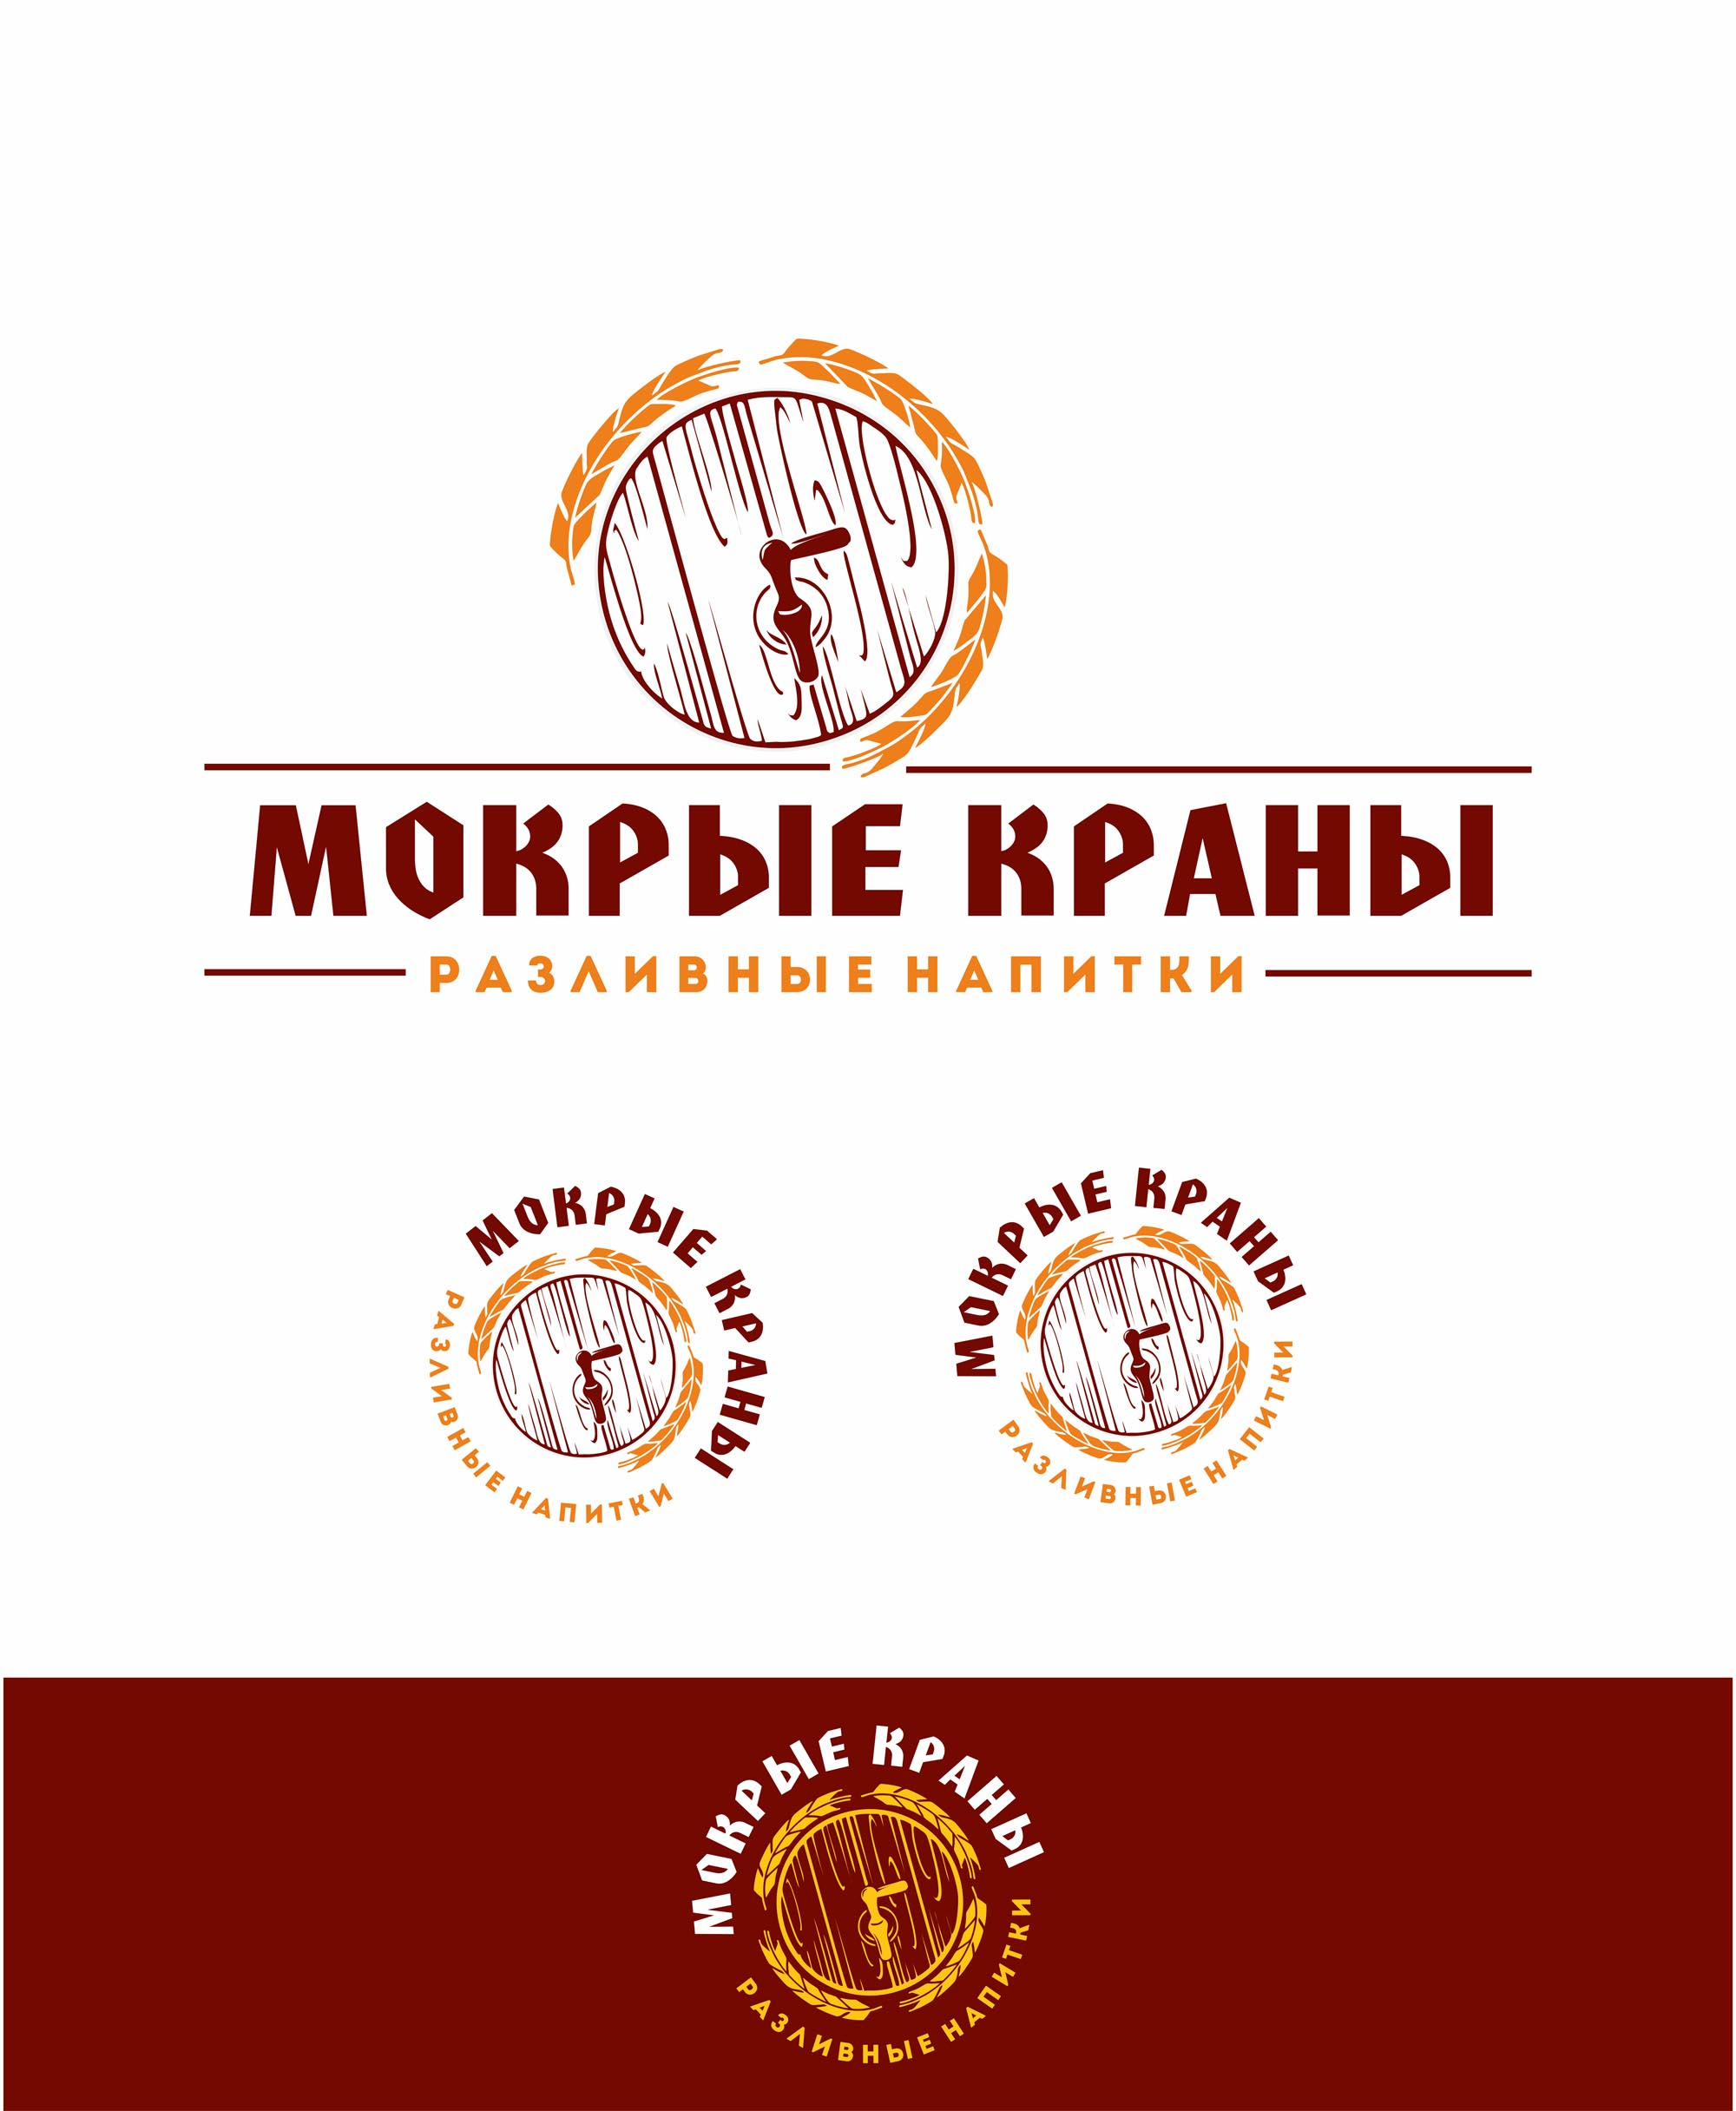 Вывеска/логотип для пивного магазина фото f_427601e1c1f24e27.jpg